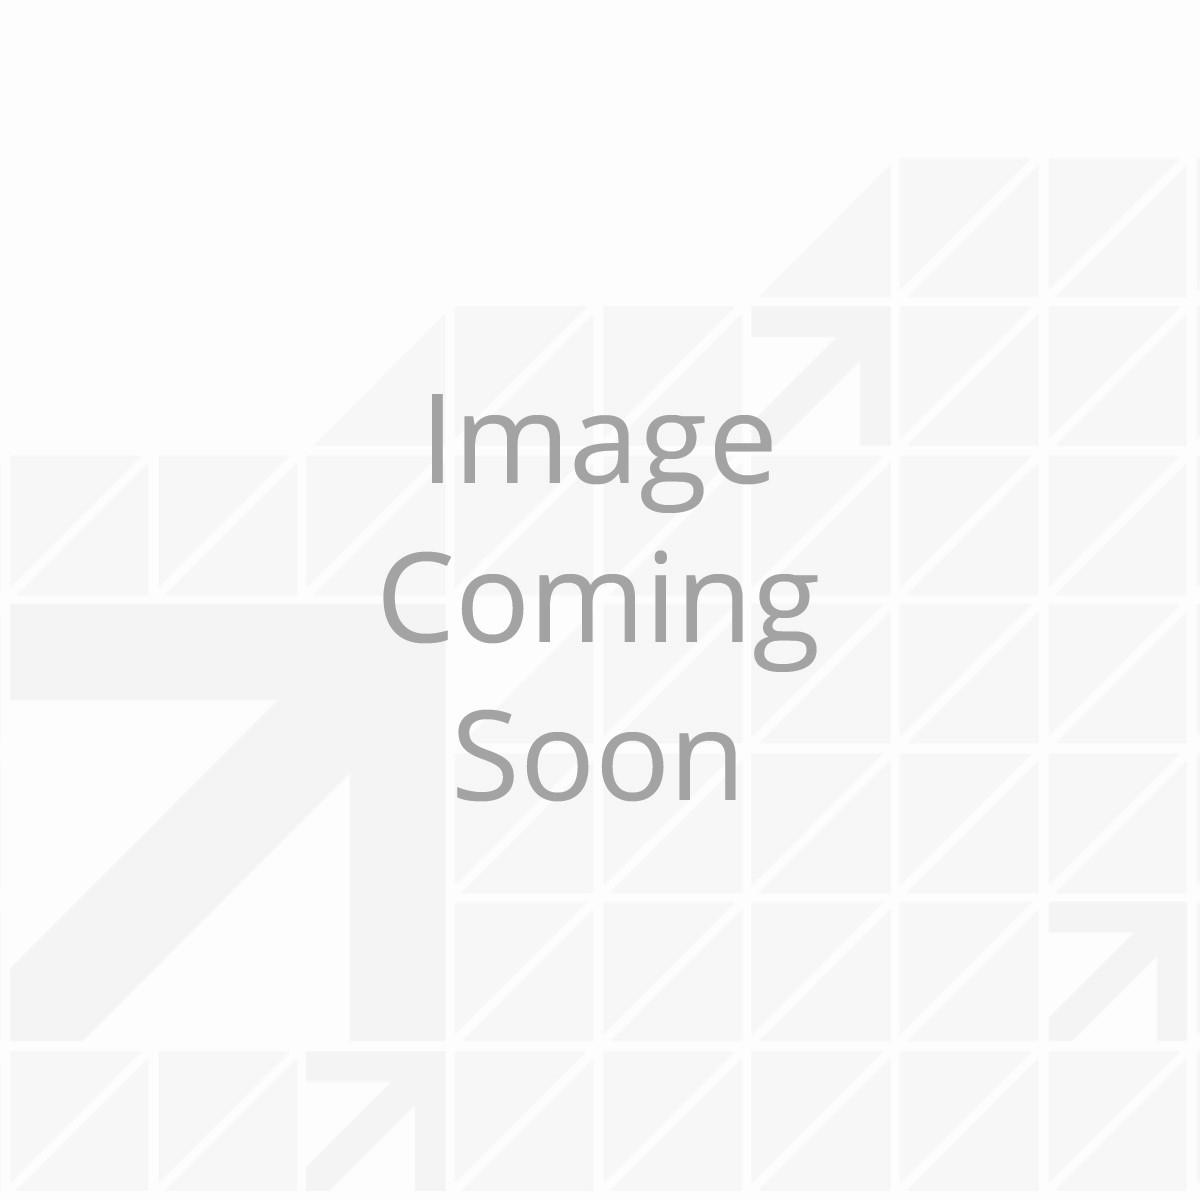 19' Power & Hybrid Awning Roller Assembly - Prepflex Blue Fade